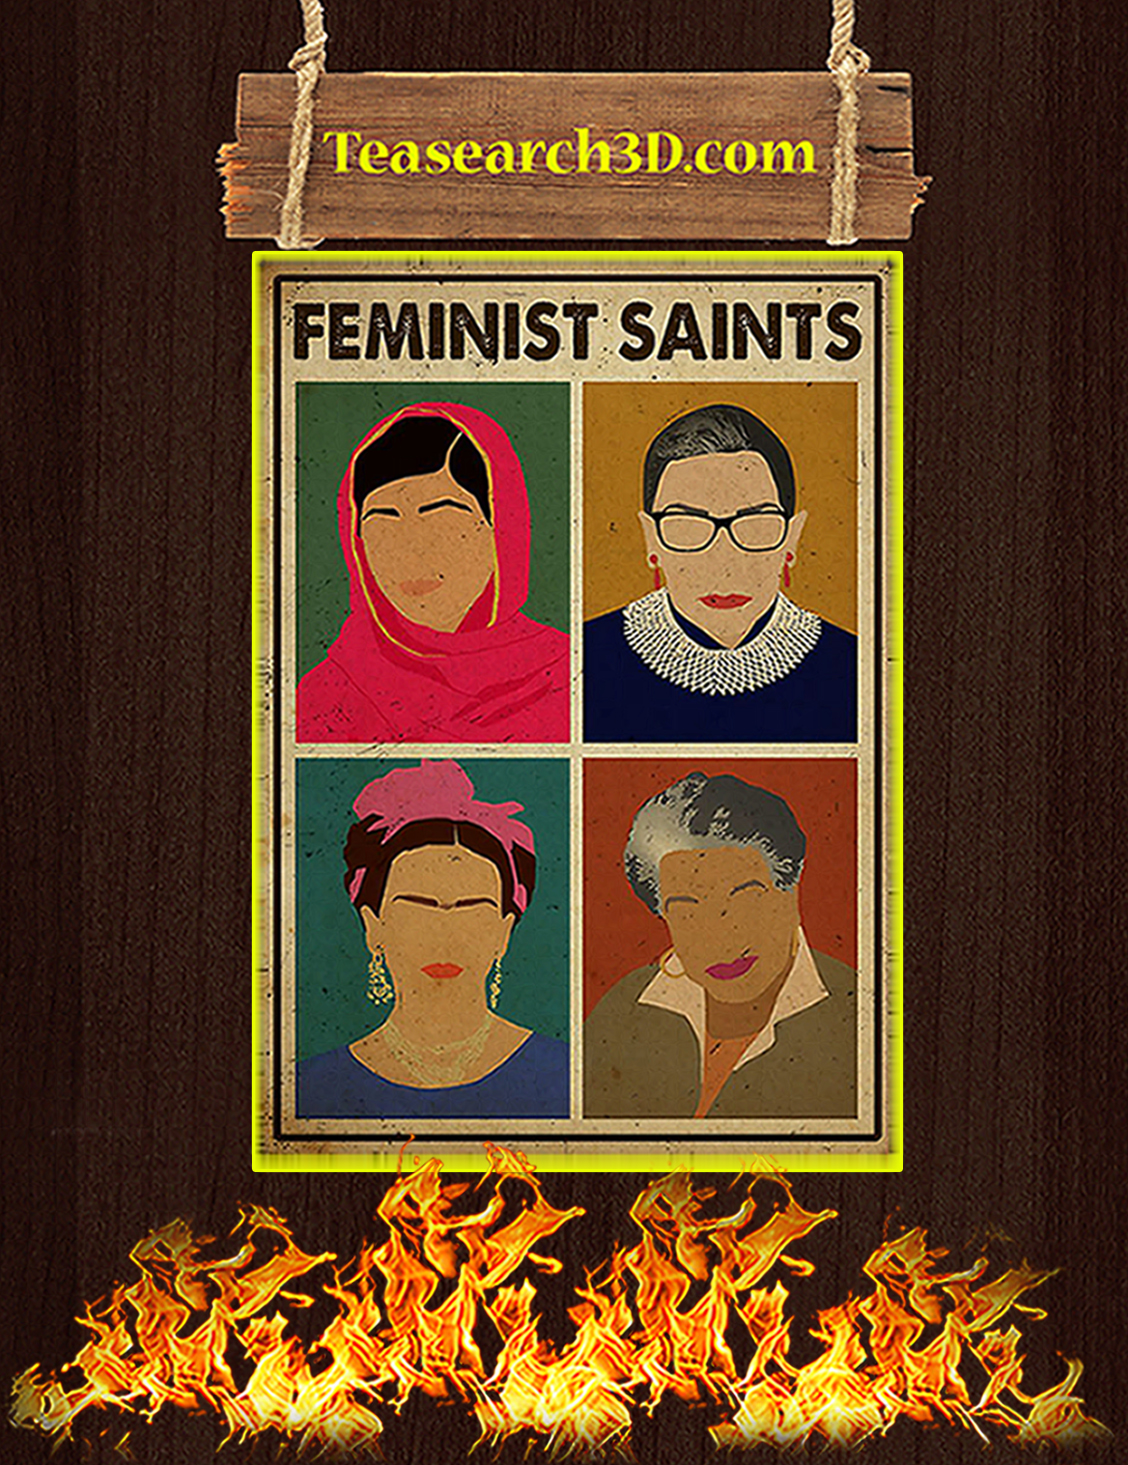 Feminist saints poster A3